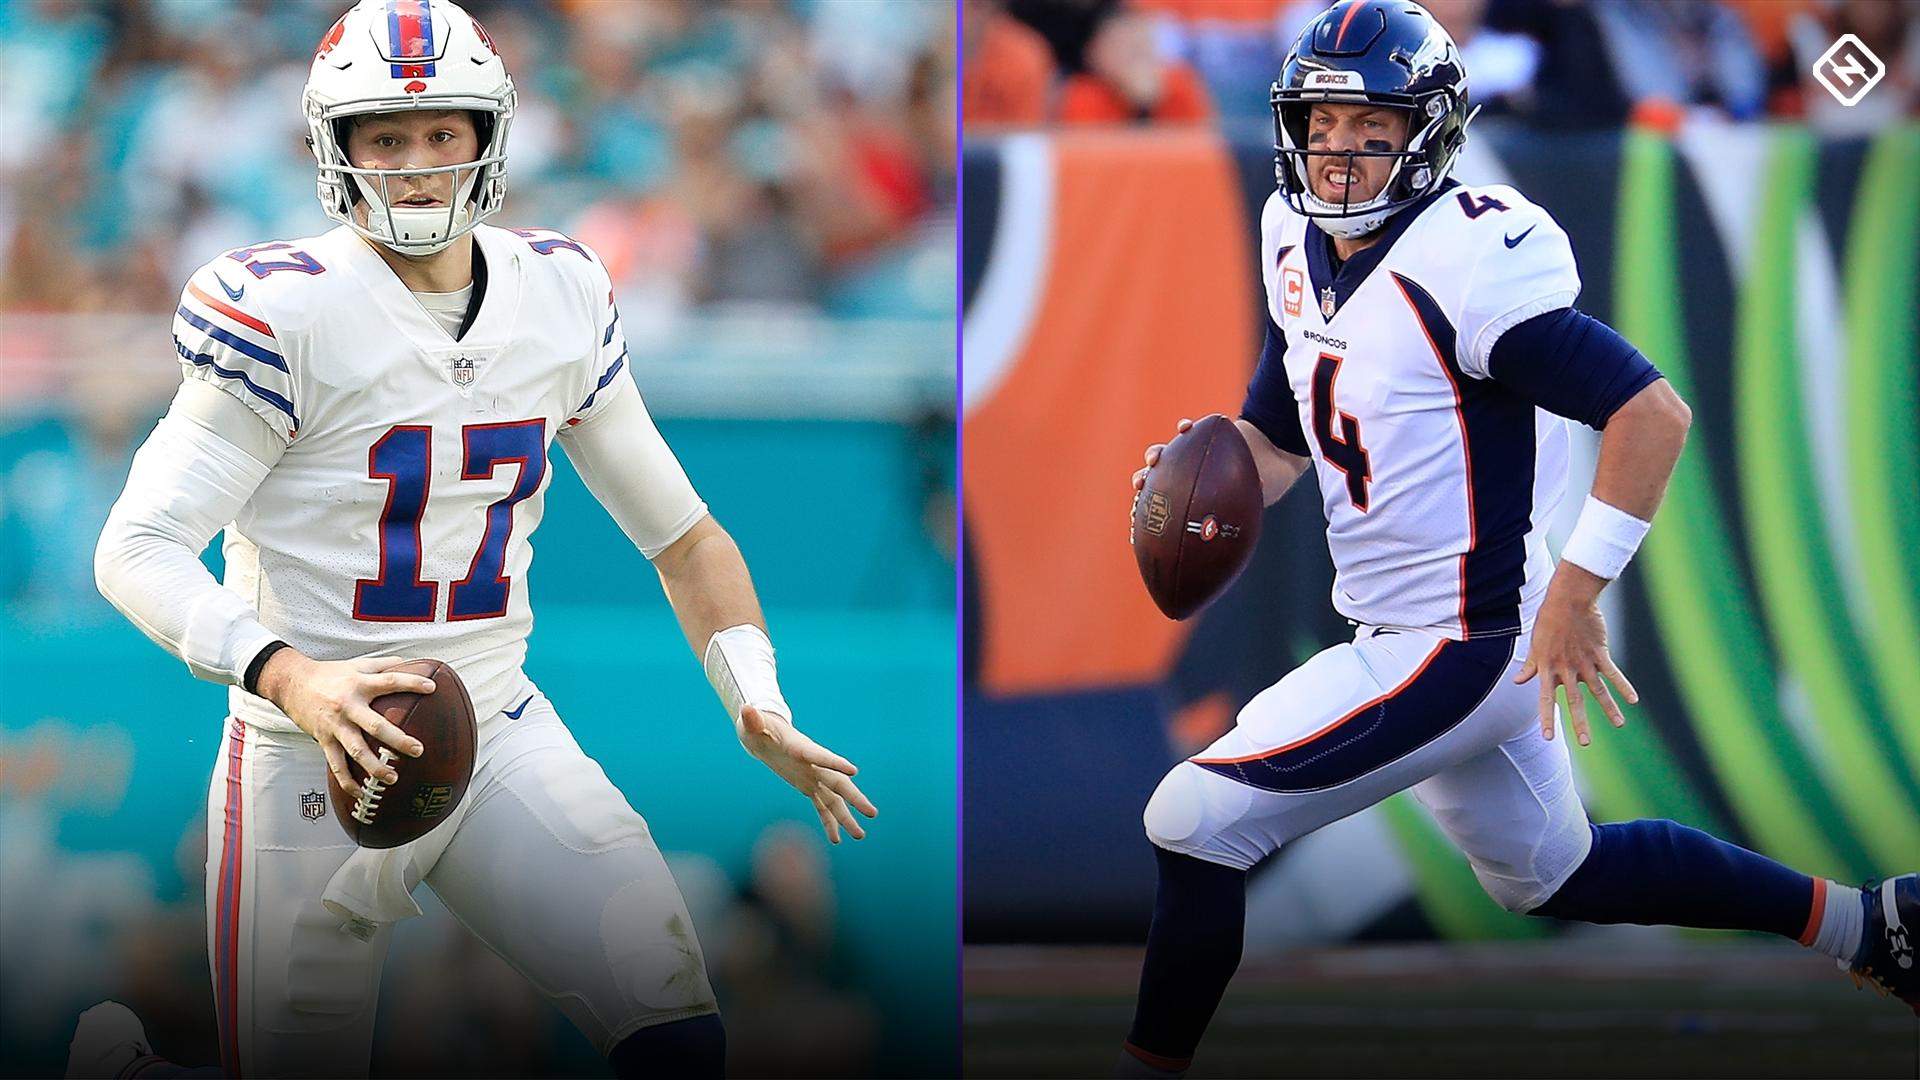 NFL Week 14 Football Betting Odds